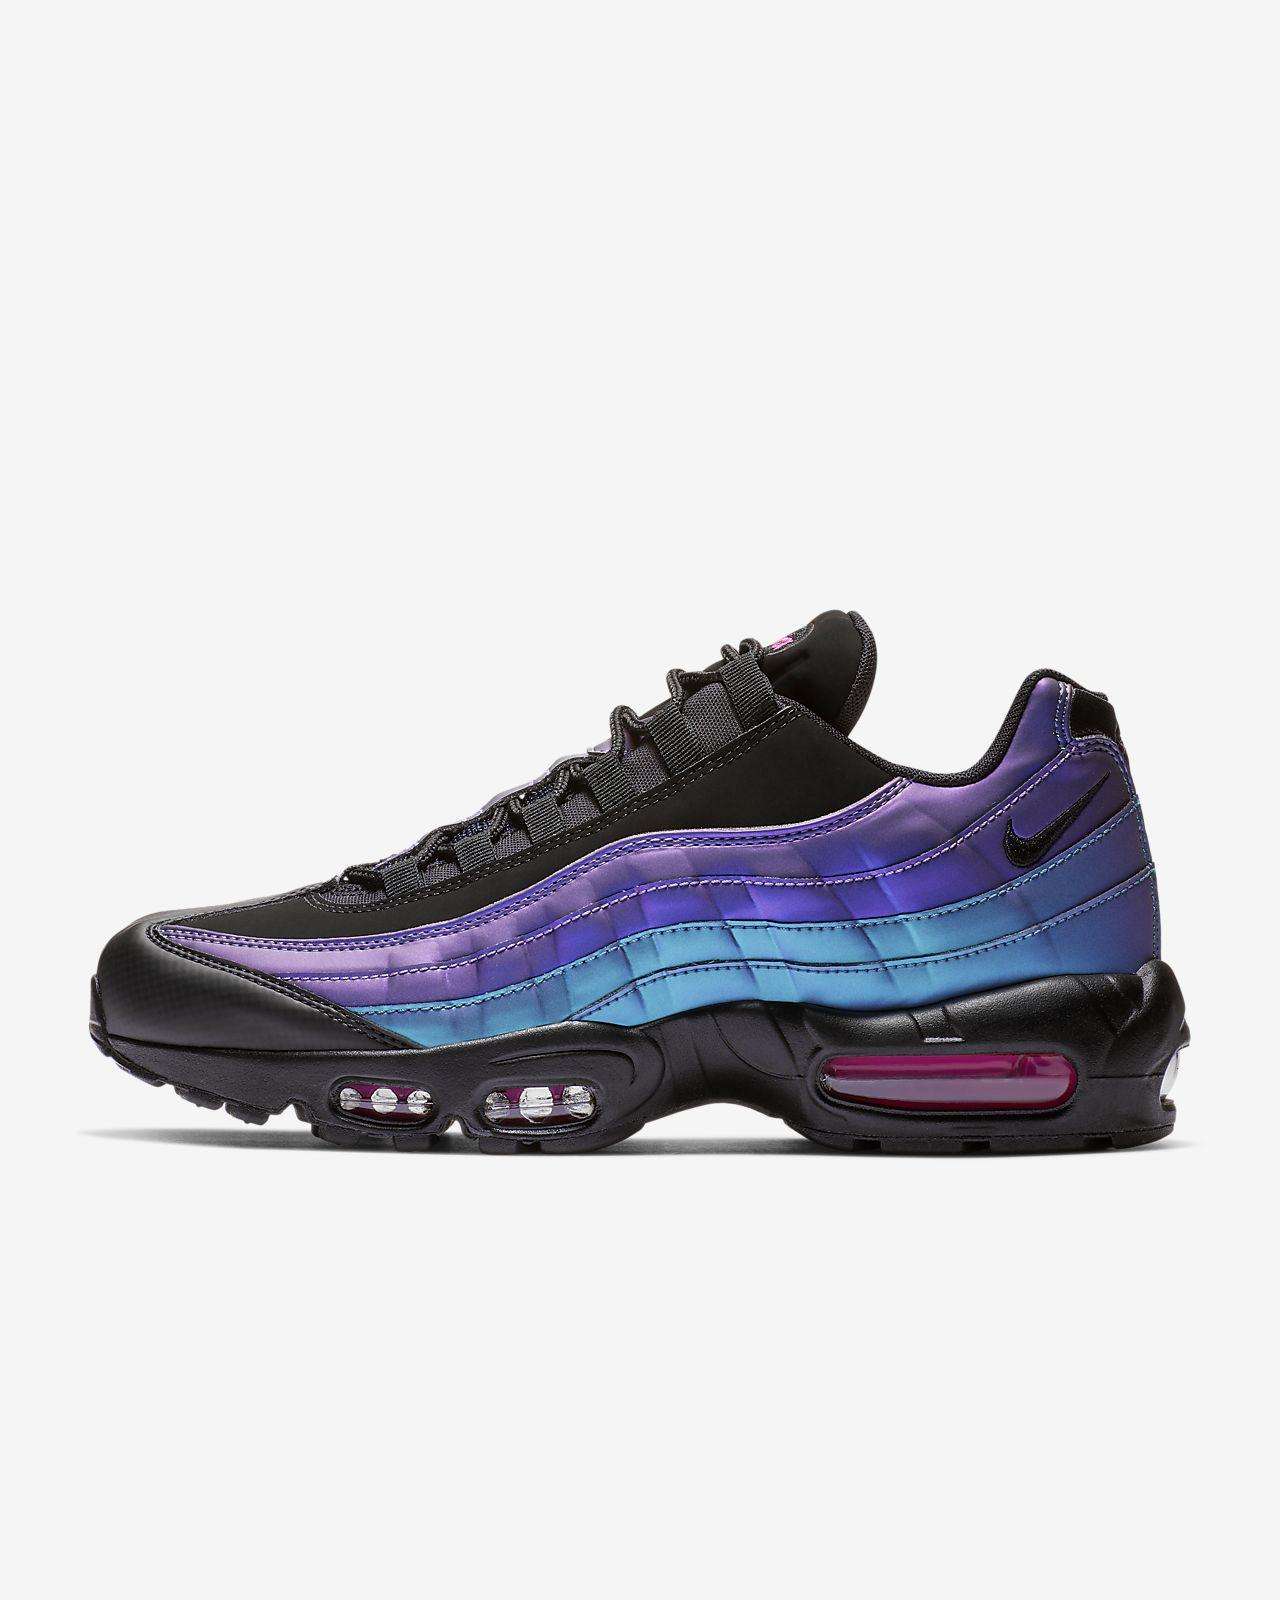 16959845d681e Nike Air Max 95 Premium Men s Shoe. Nike.com